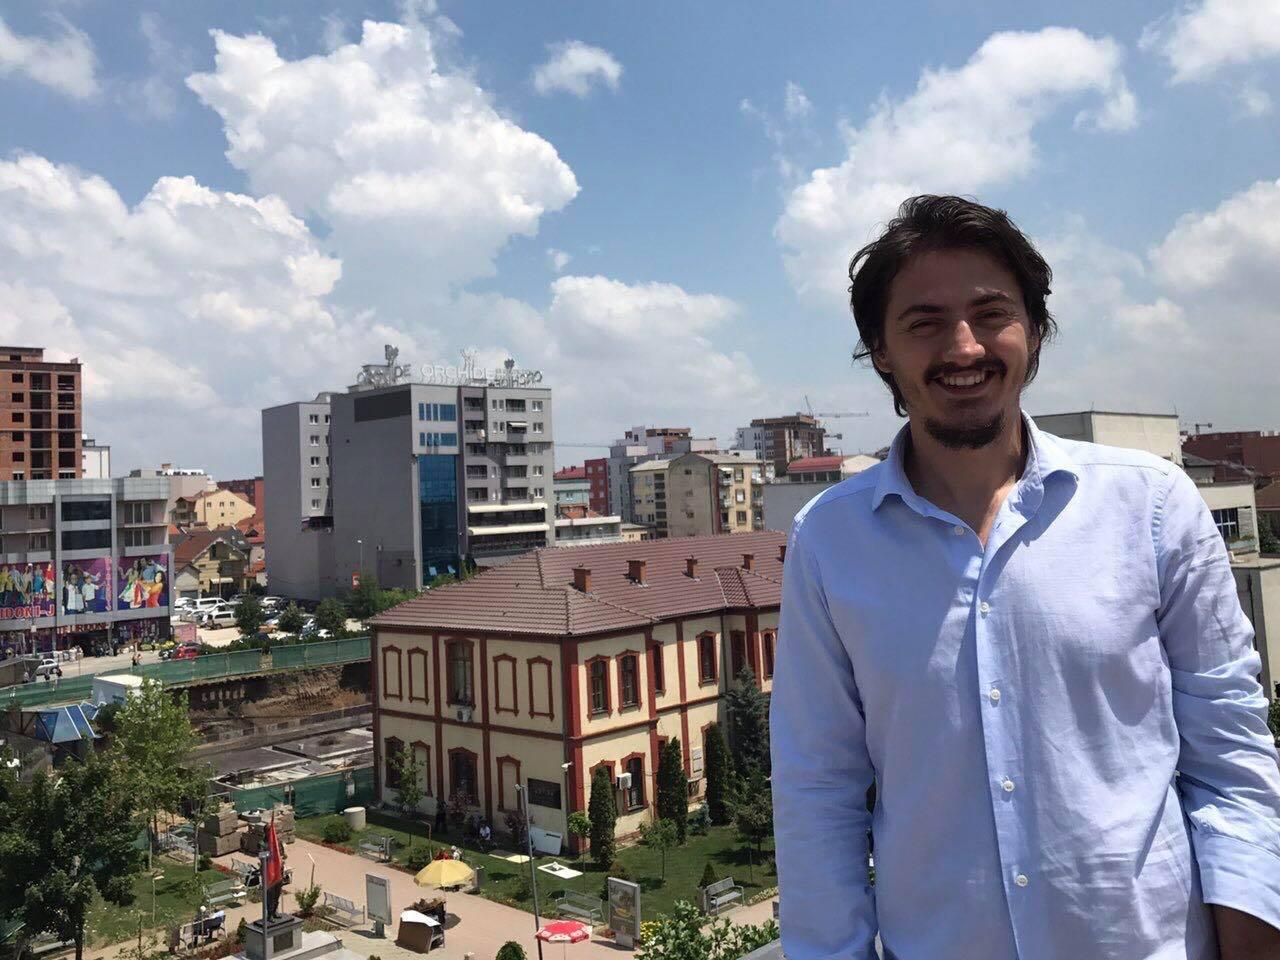 The former UBT student, Gramos Kamberi won the Fulbright Scholarship